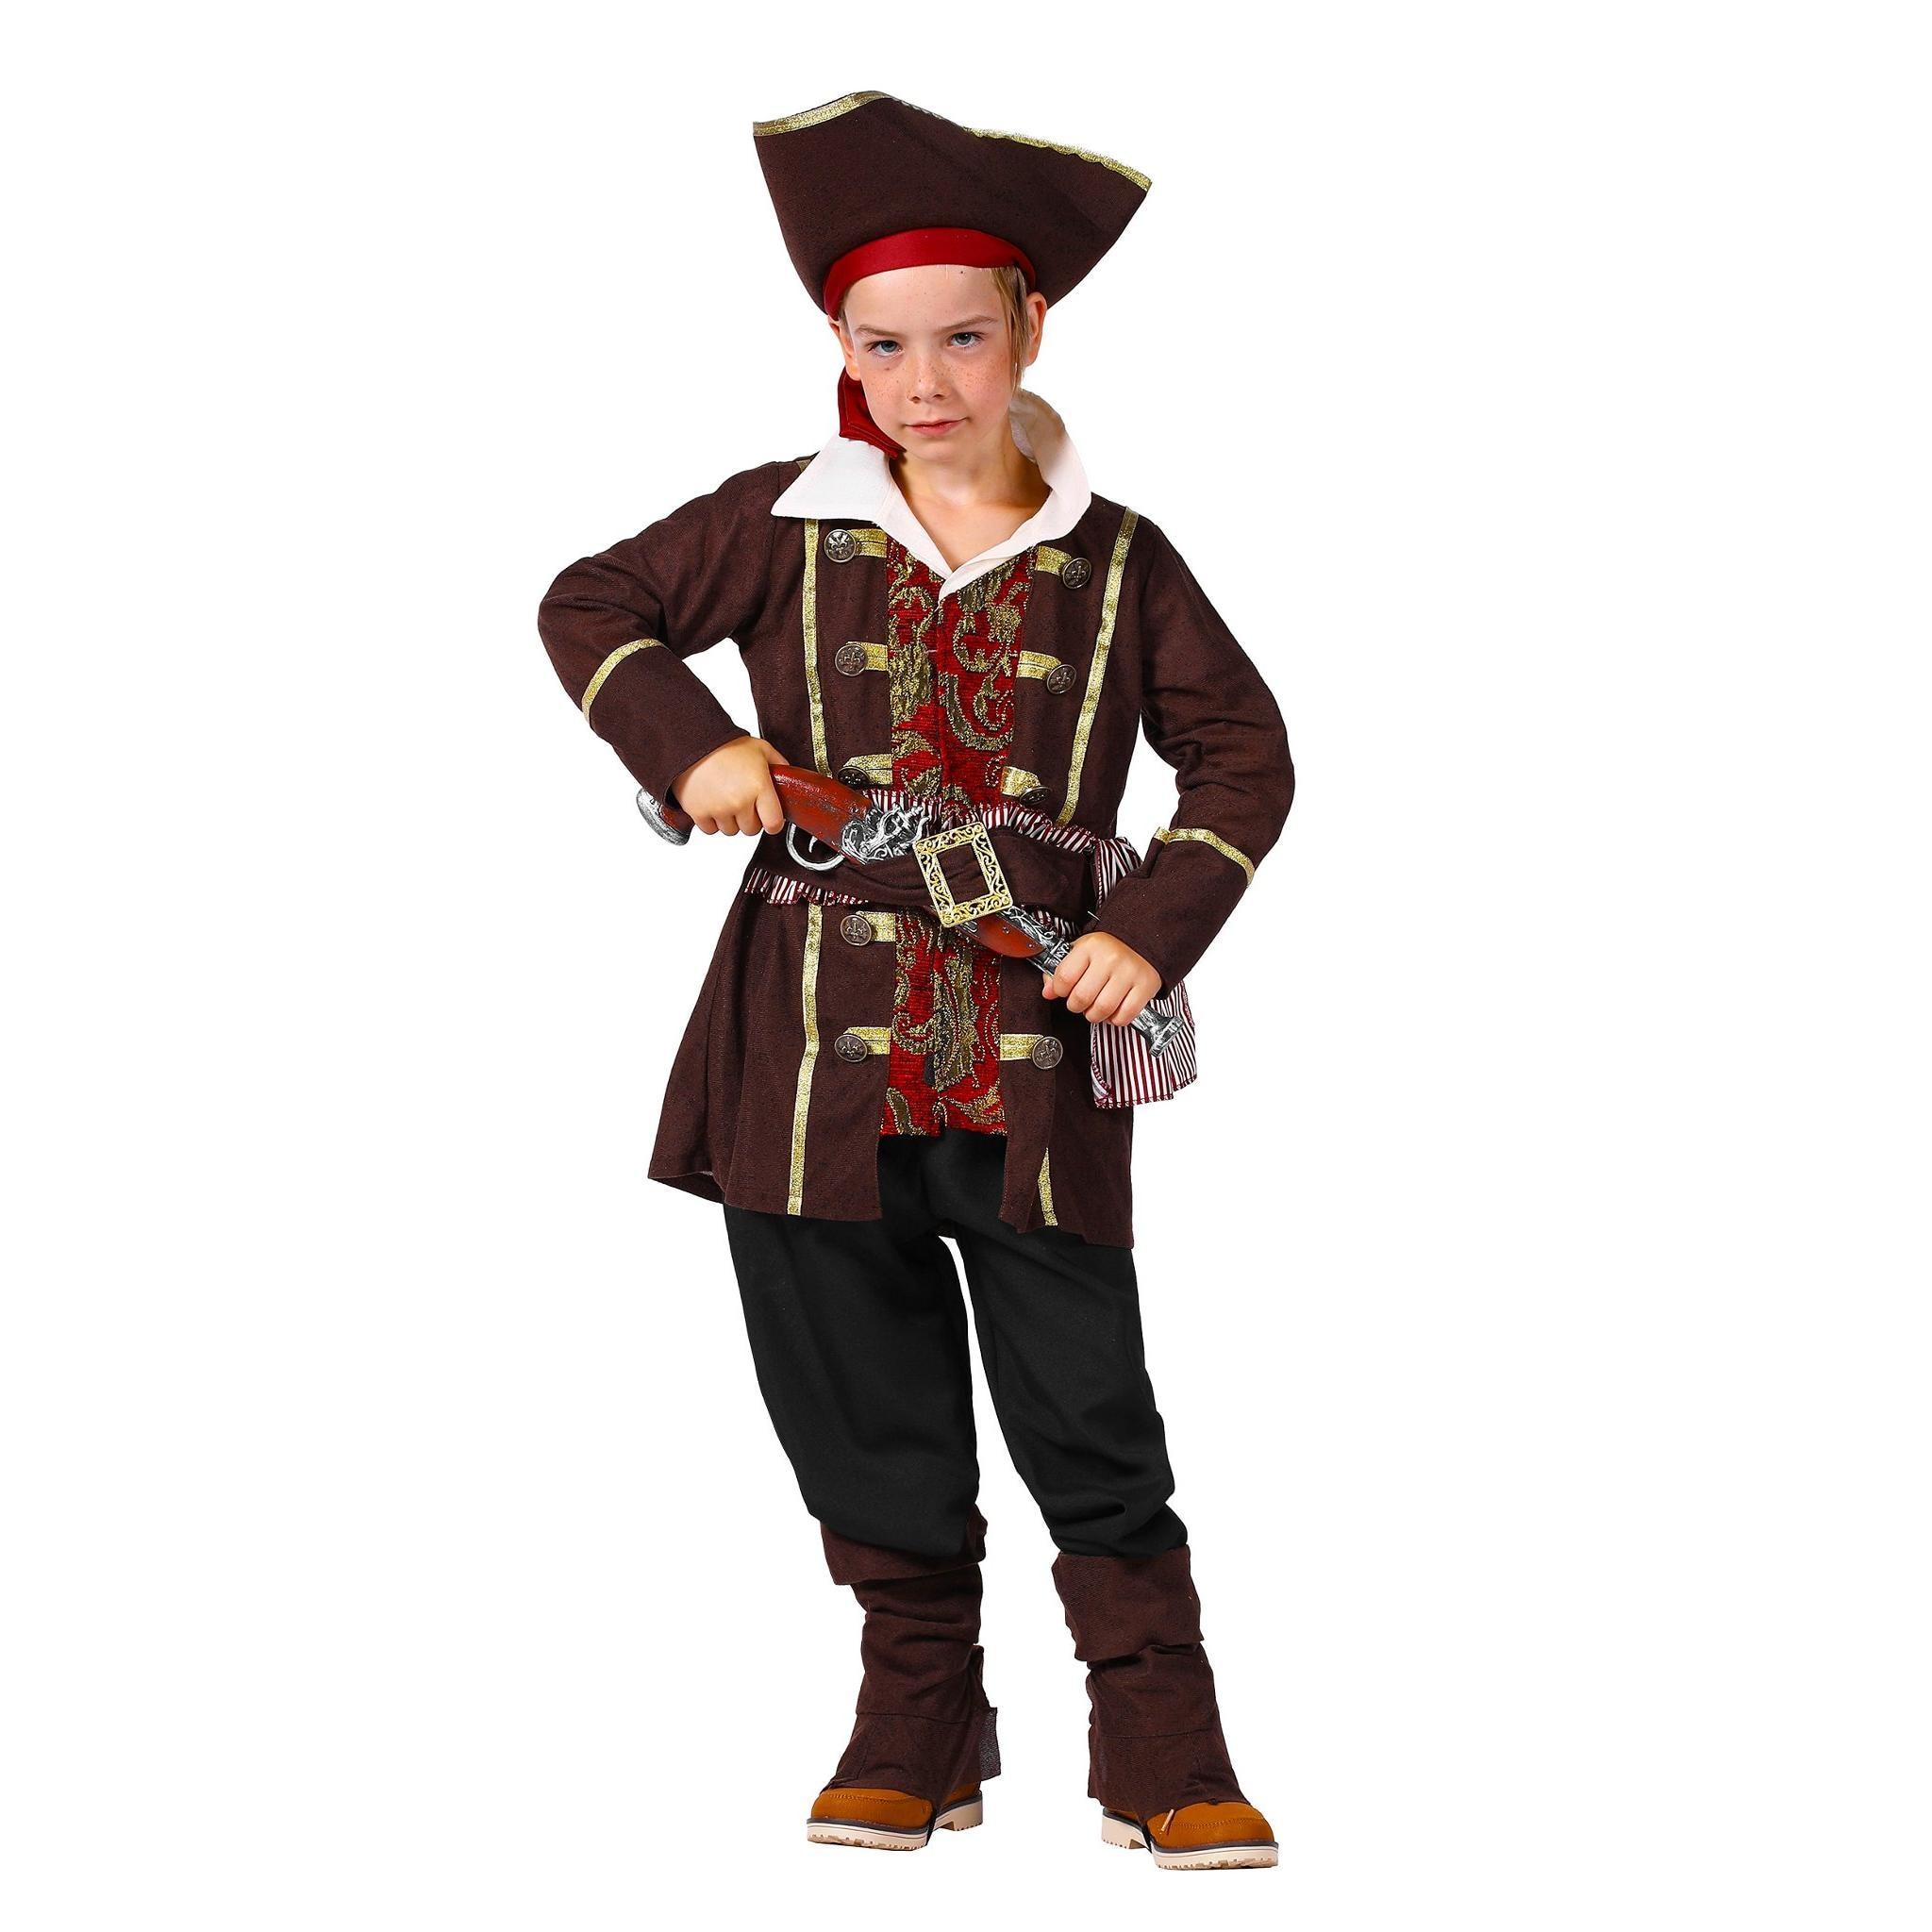 Thetru Piratenprinz Kinderkostüm